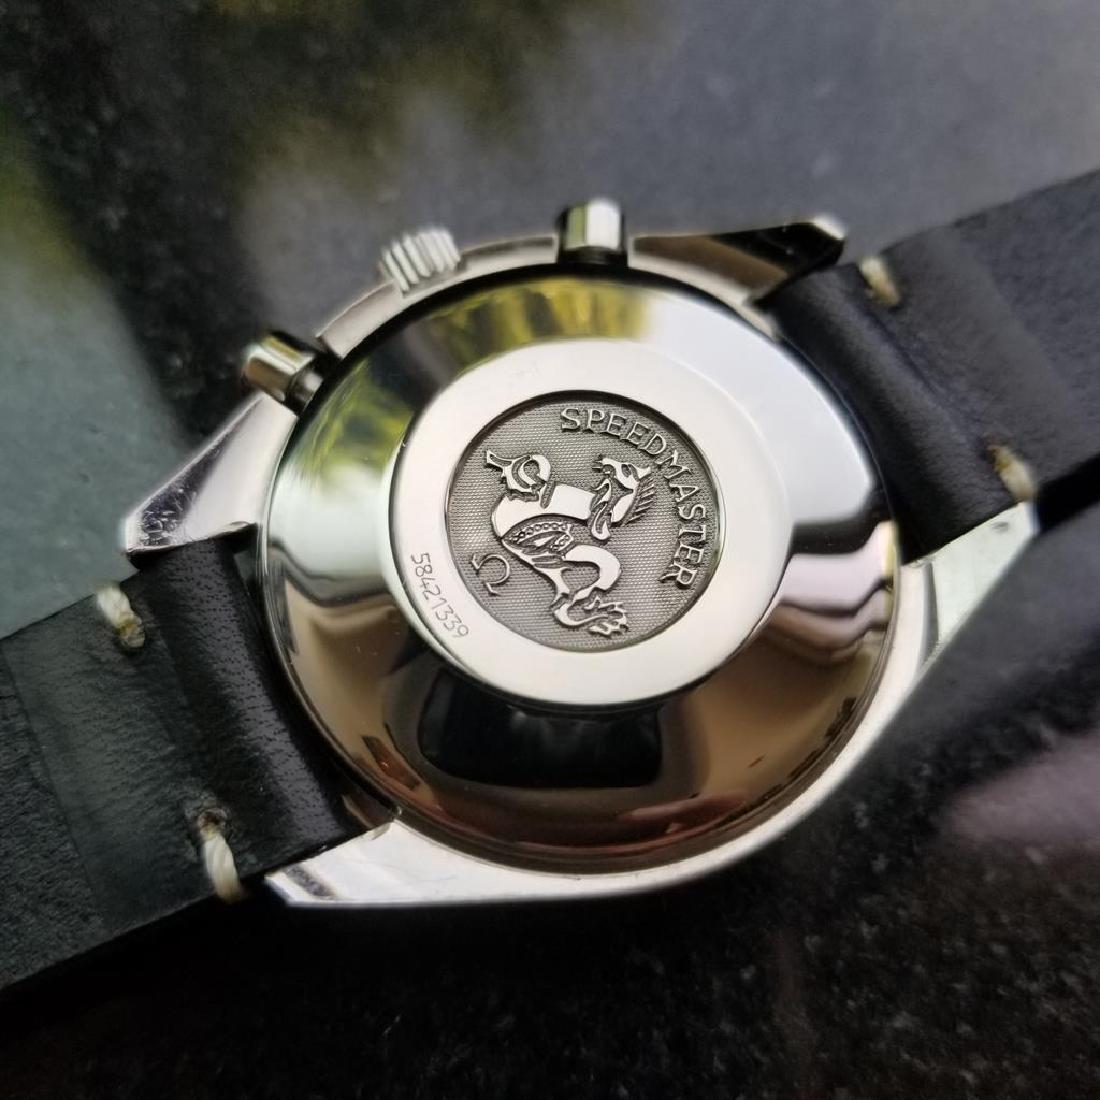 OMEGA Men's Speedmaster Automatic Chronograph 175.0083 - 6